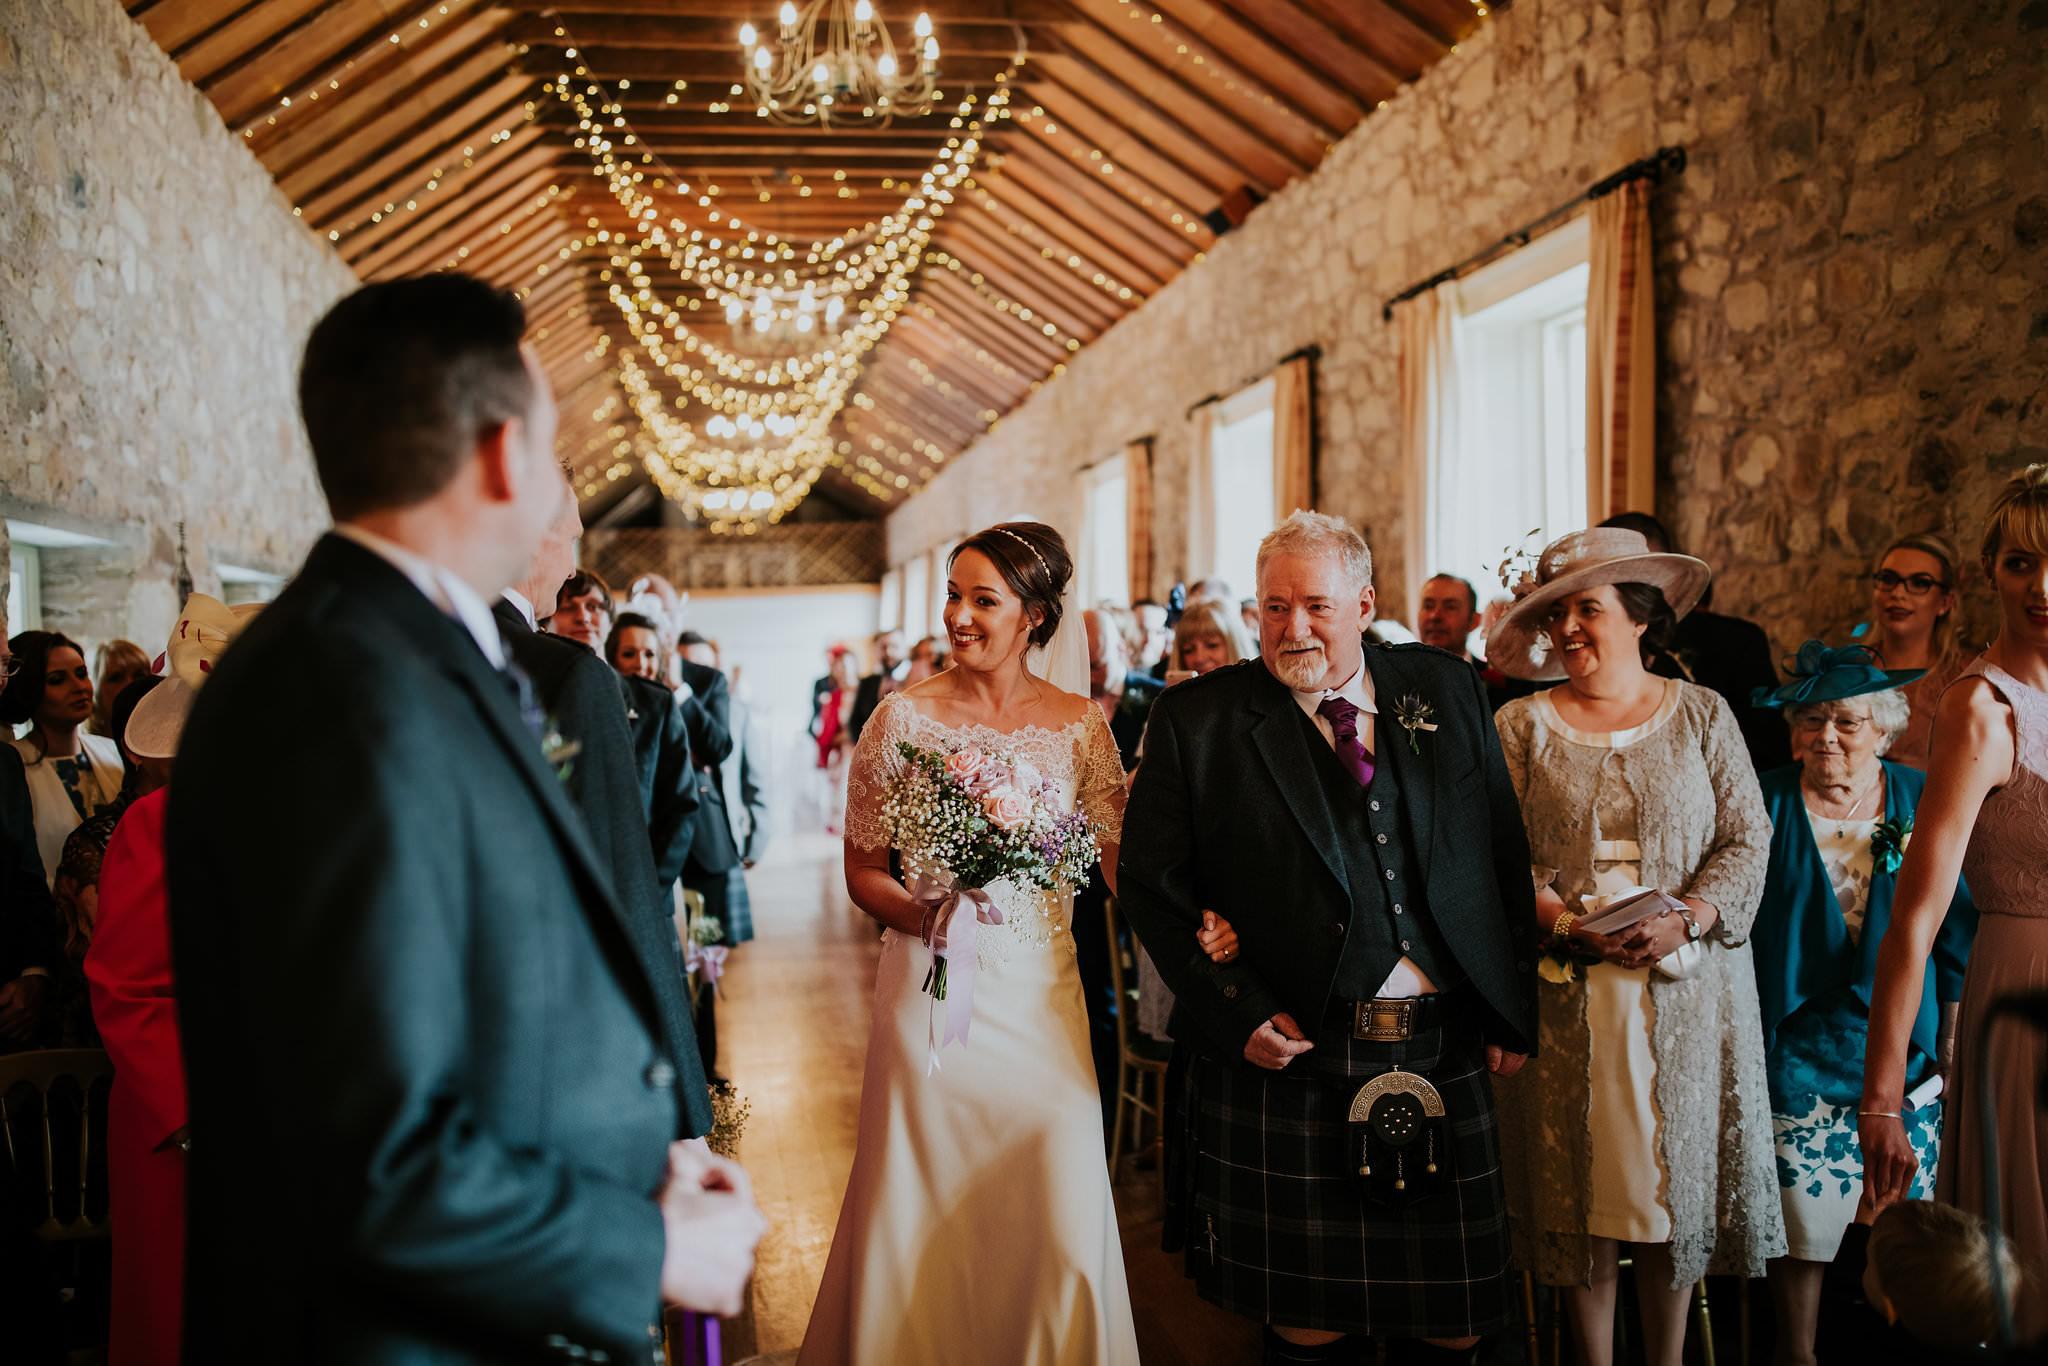 kirknewton stables wedding photographer (30).jpg